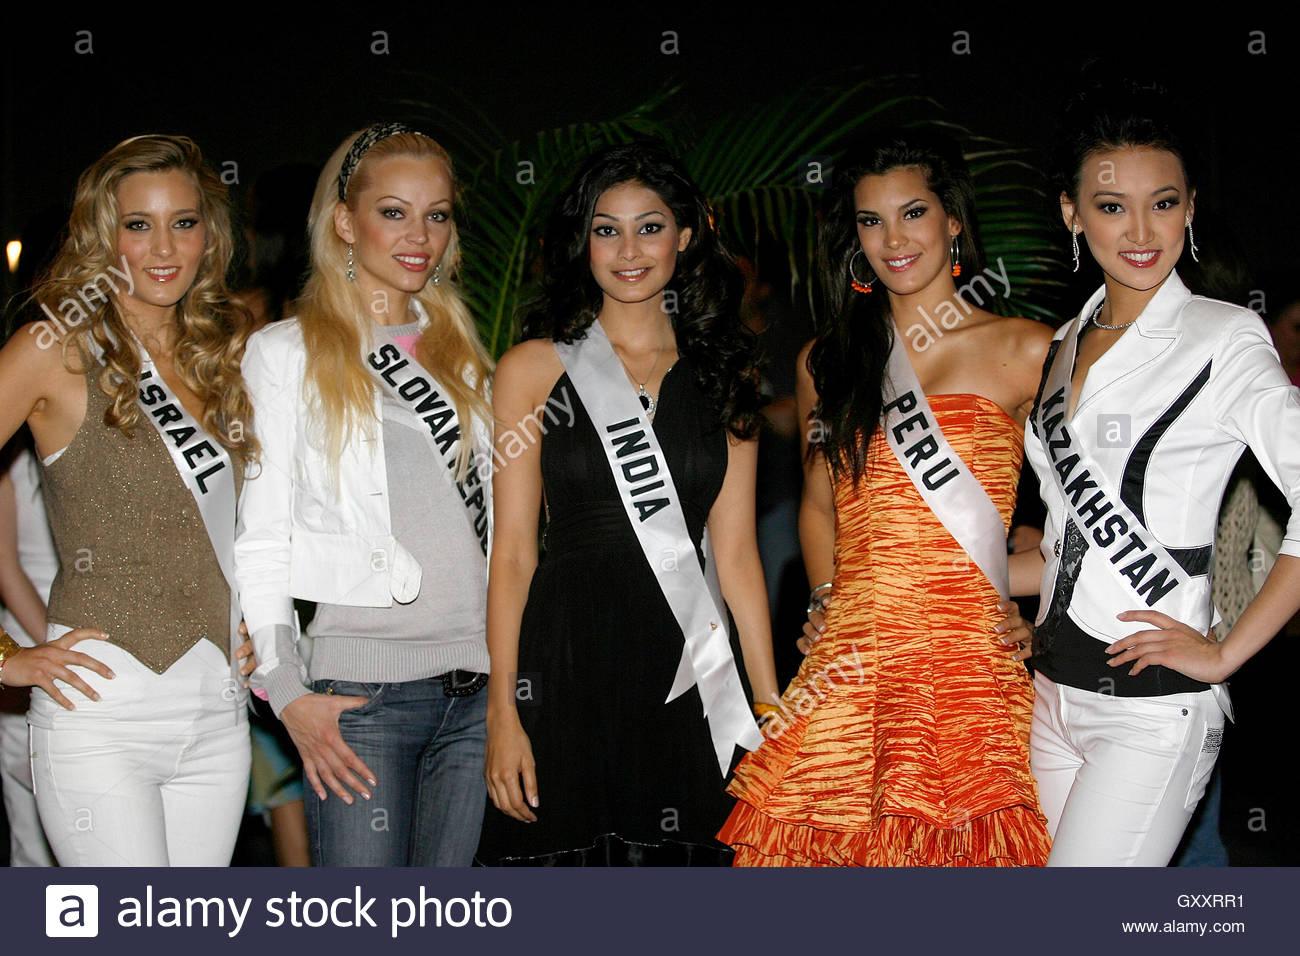 jimena elias, miss peru universe 2007, 1 st runner-up de miss teen international 2006. - Página 3 Miss-i10